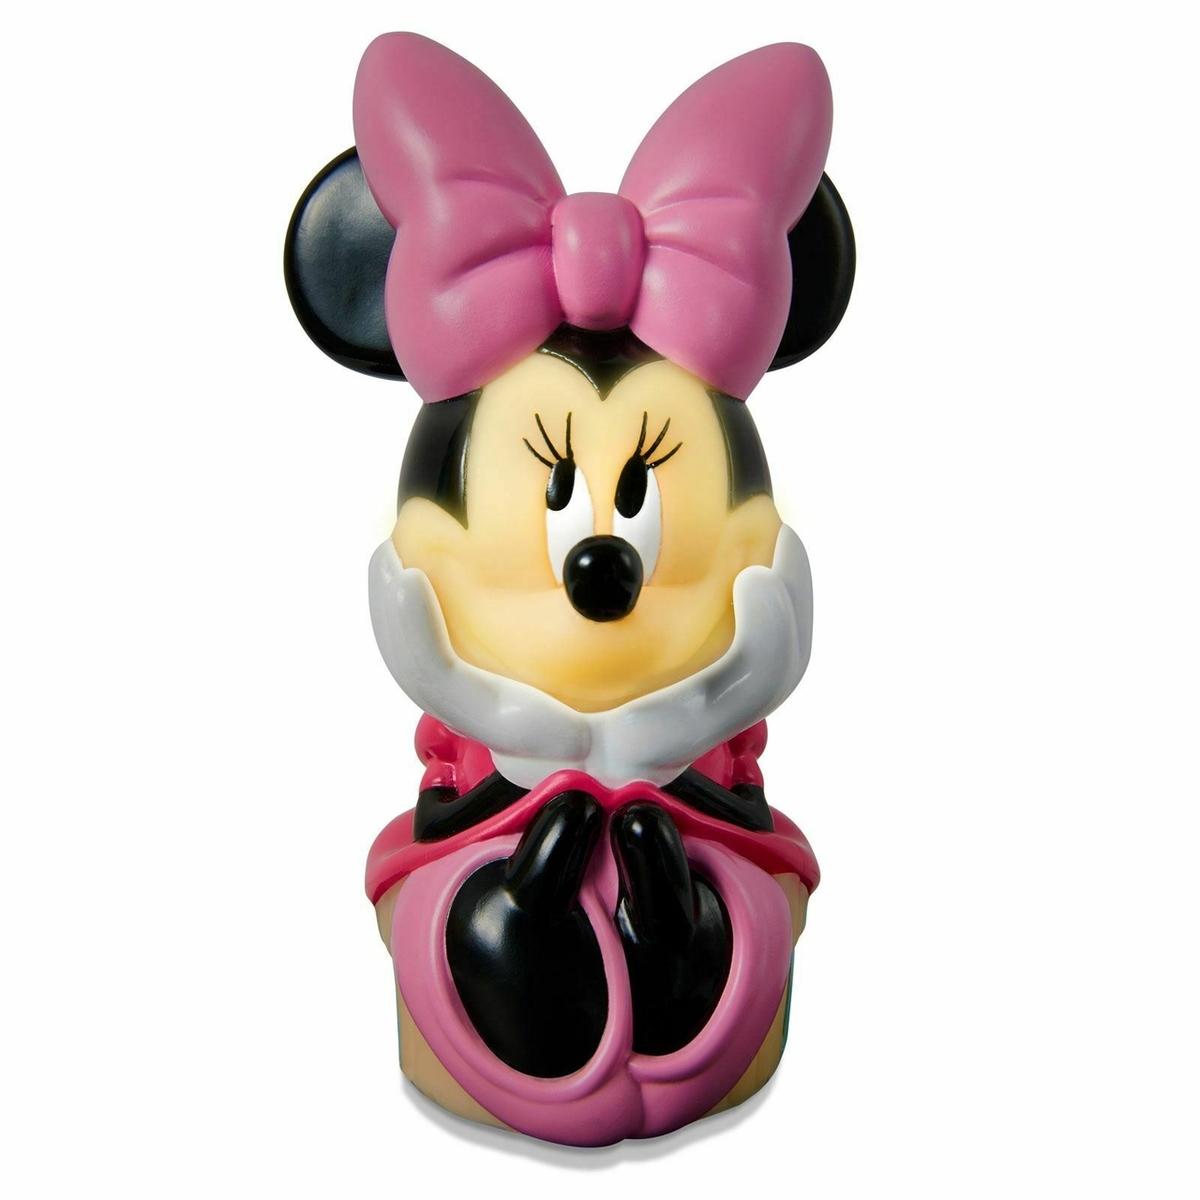 Lampička a baterka 2v1 - Minnie Mouse lamp